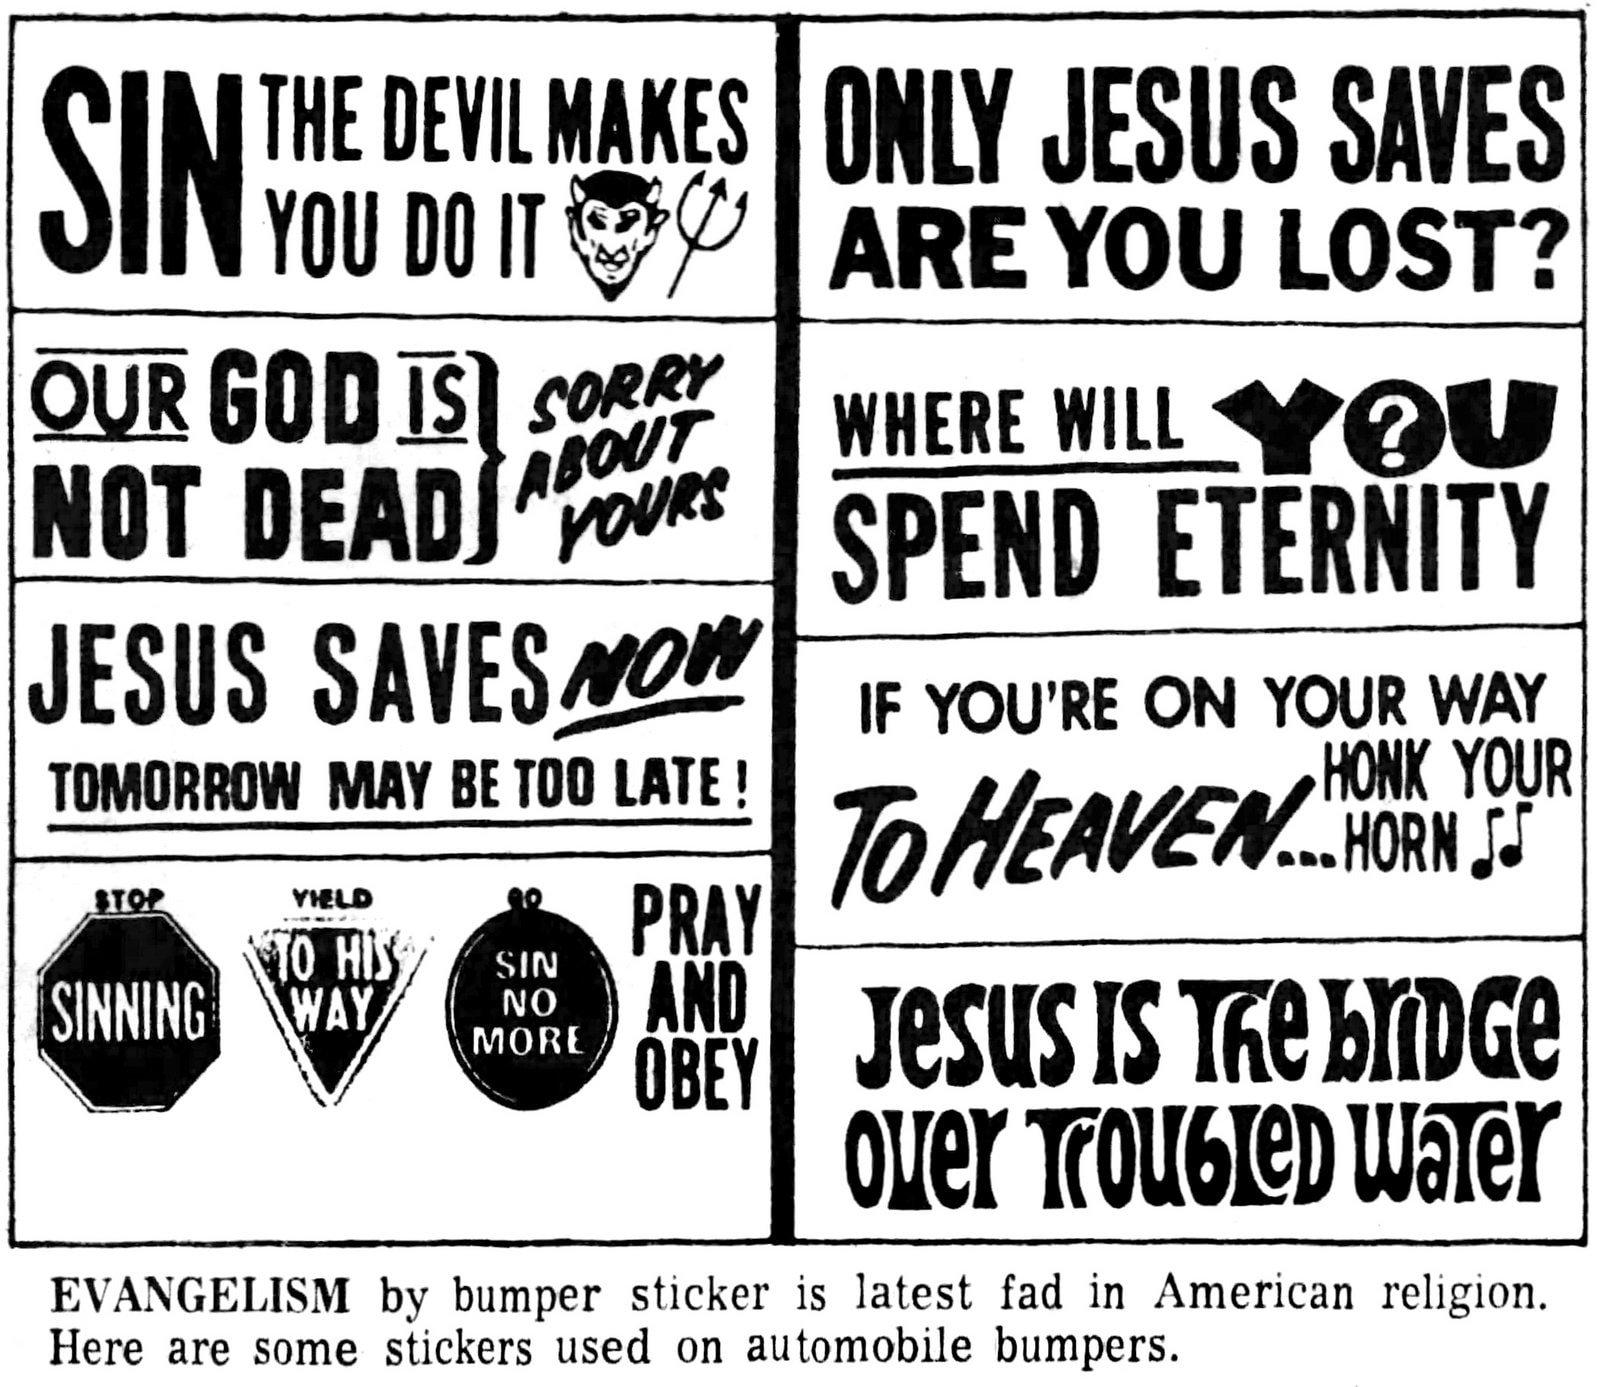 Old evangeical religious Christian bumper sticker slogans (1973)